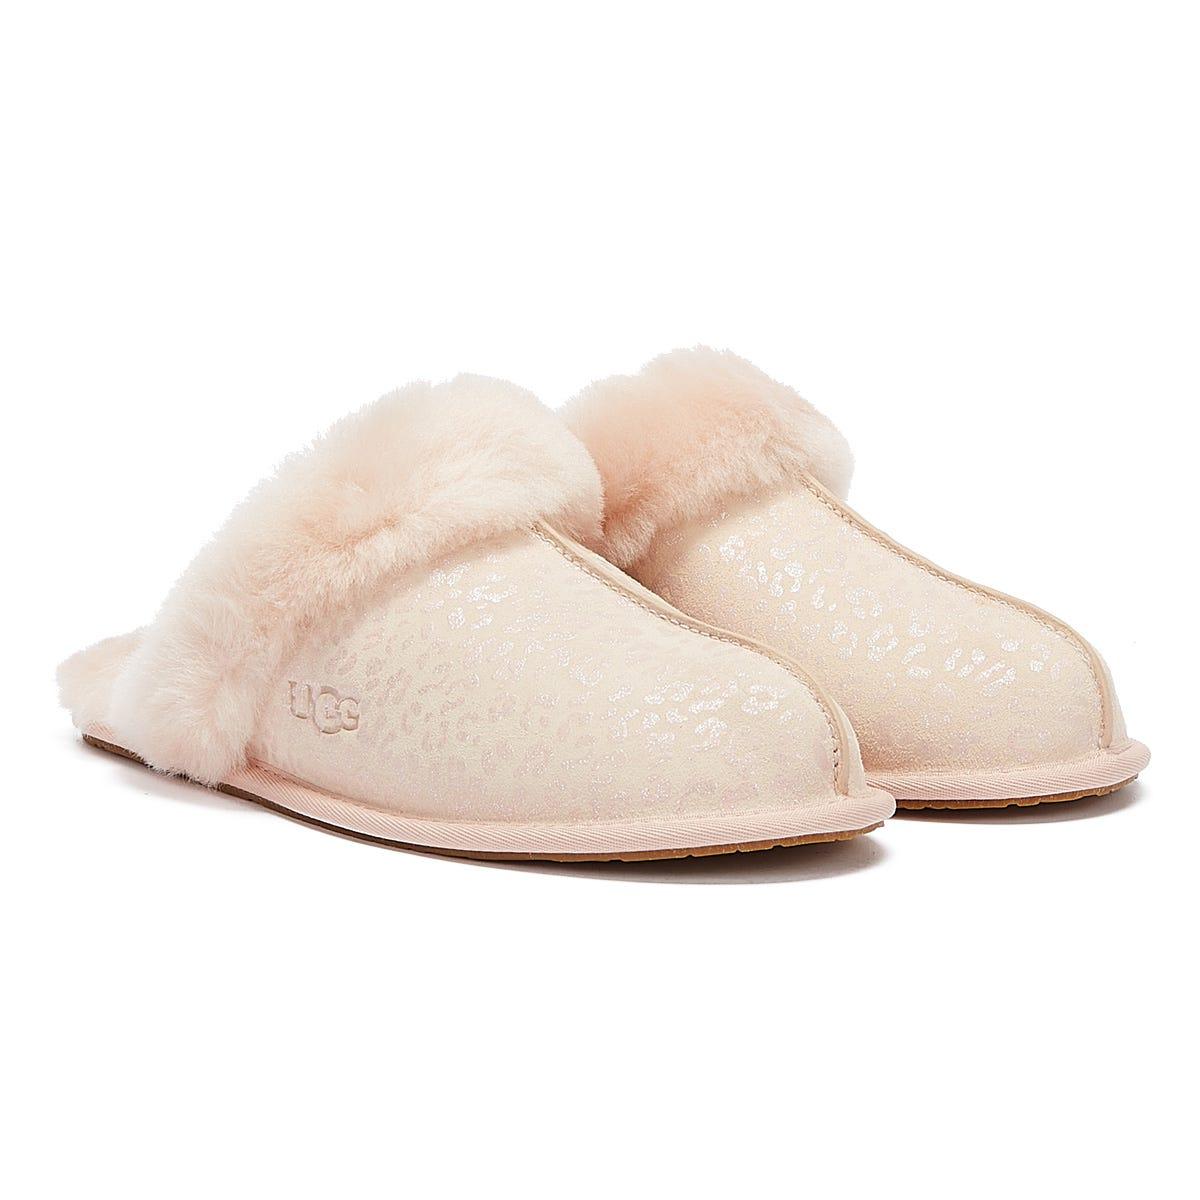 UGG Scuffette II Snow Leopard Womens Light Pink Slippers UK 3